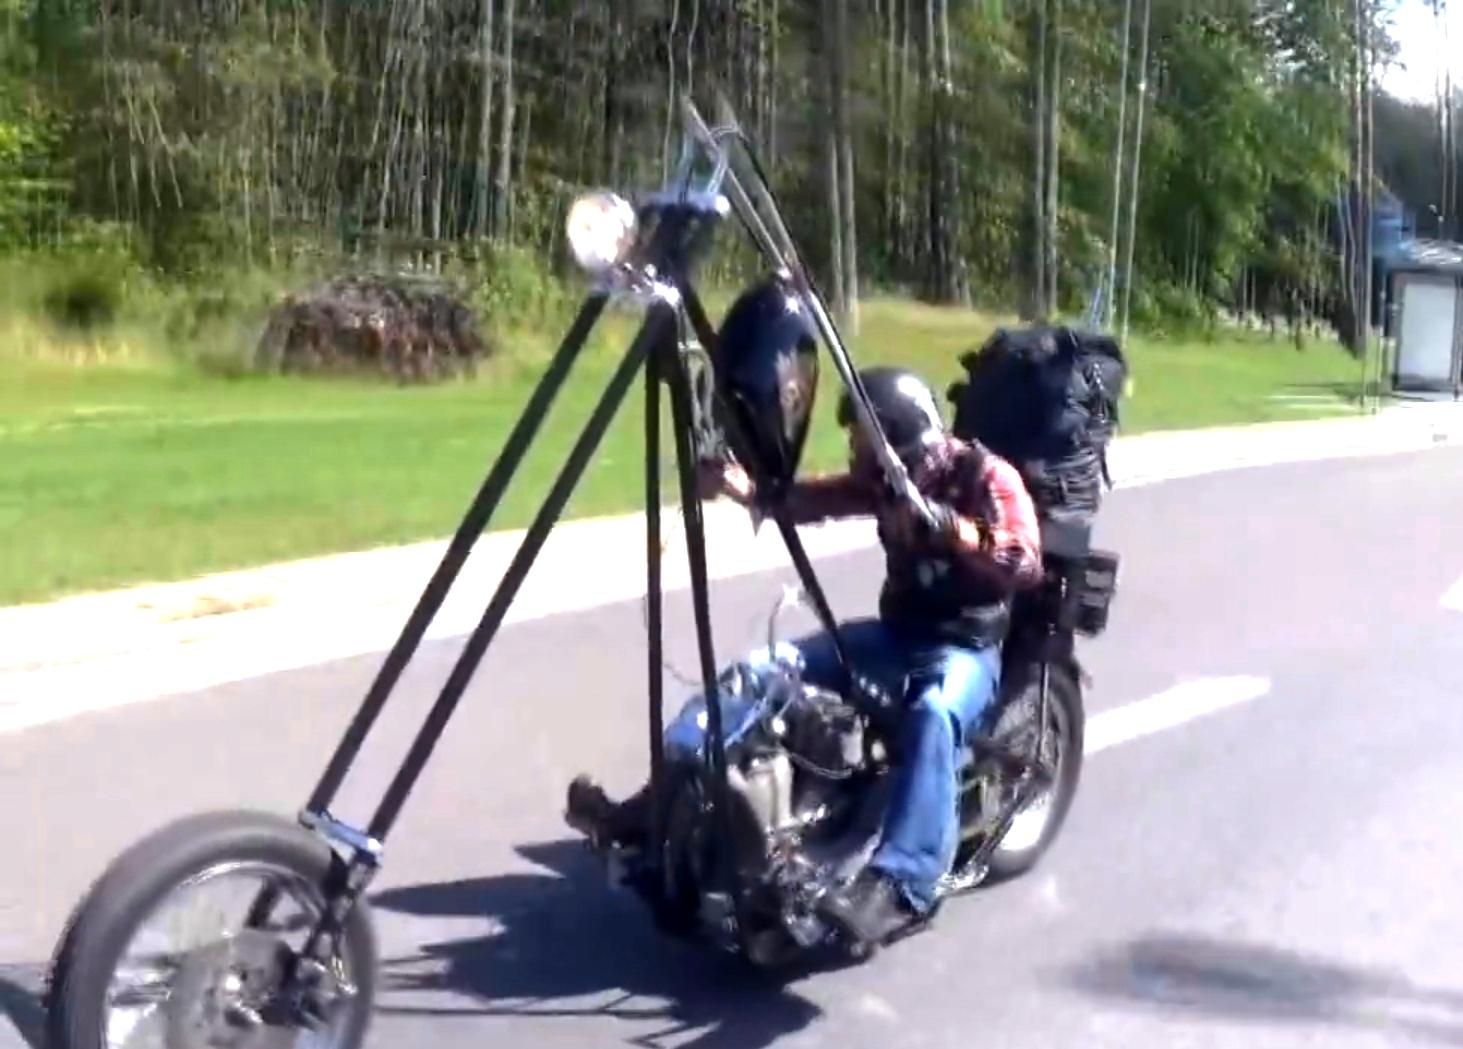 Best motorcycle handlebars - 4 Photos